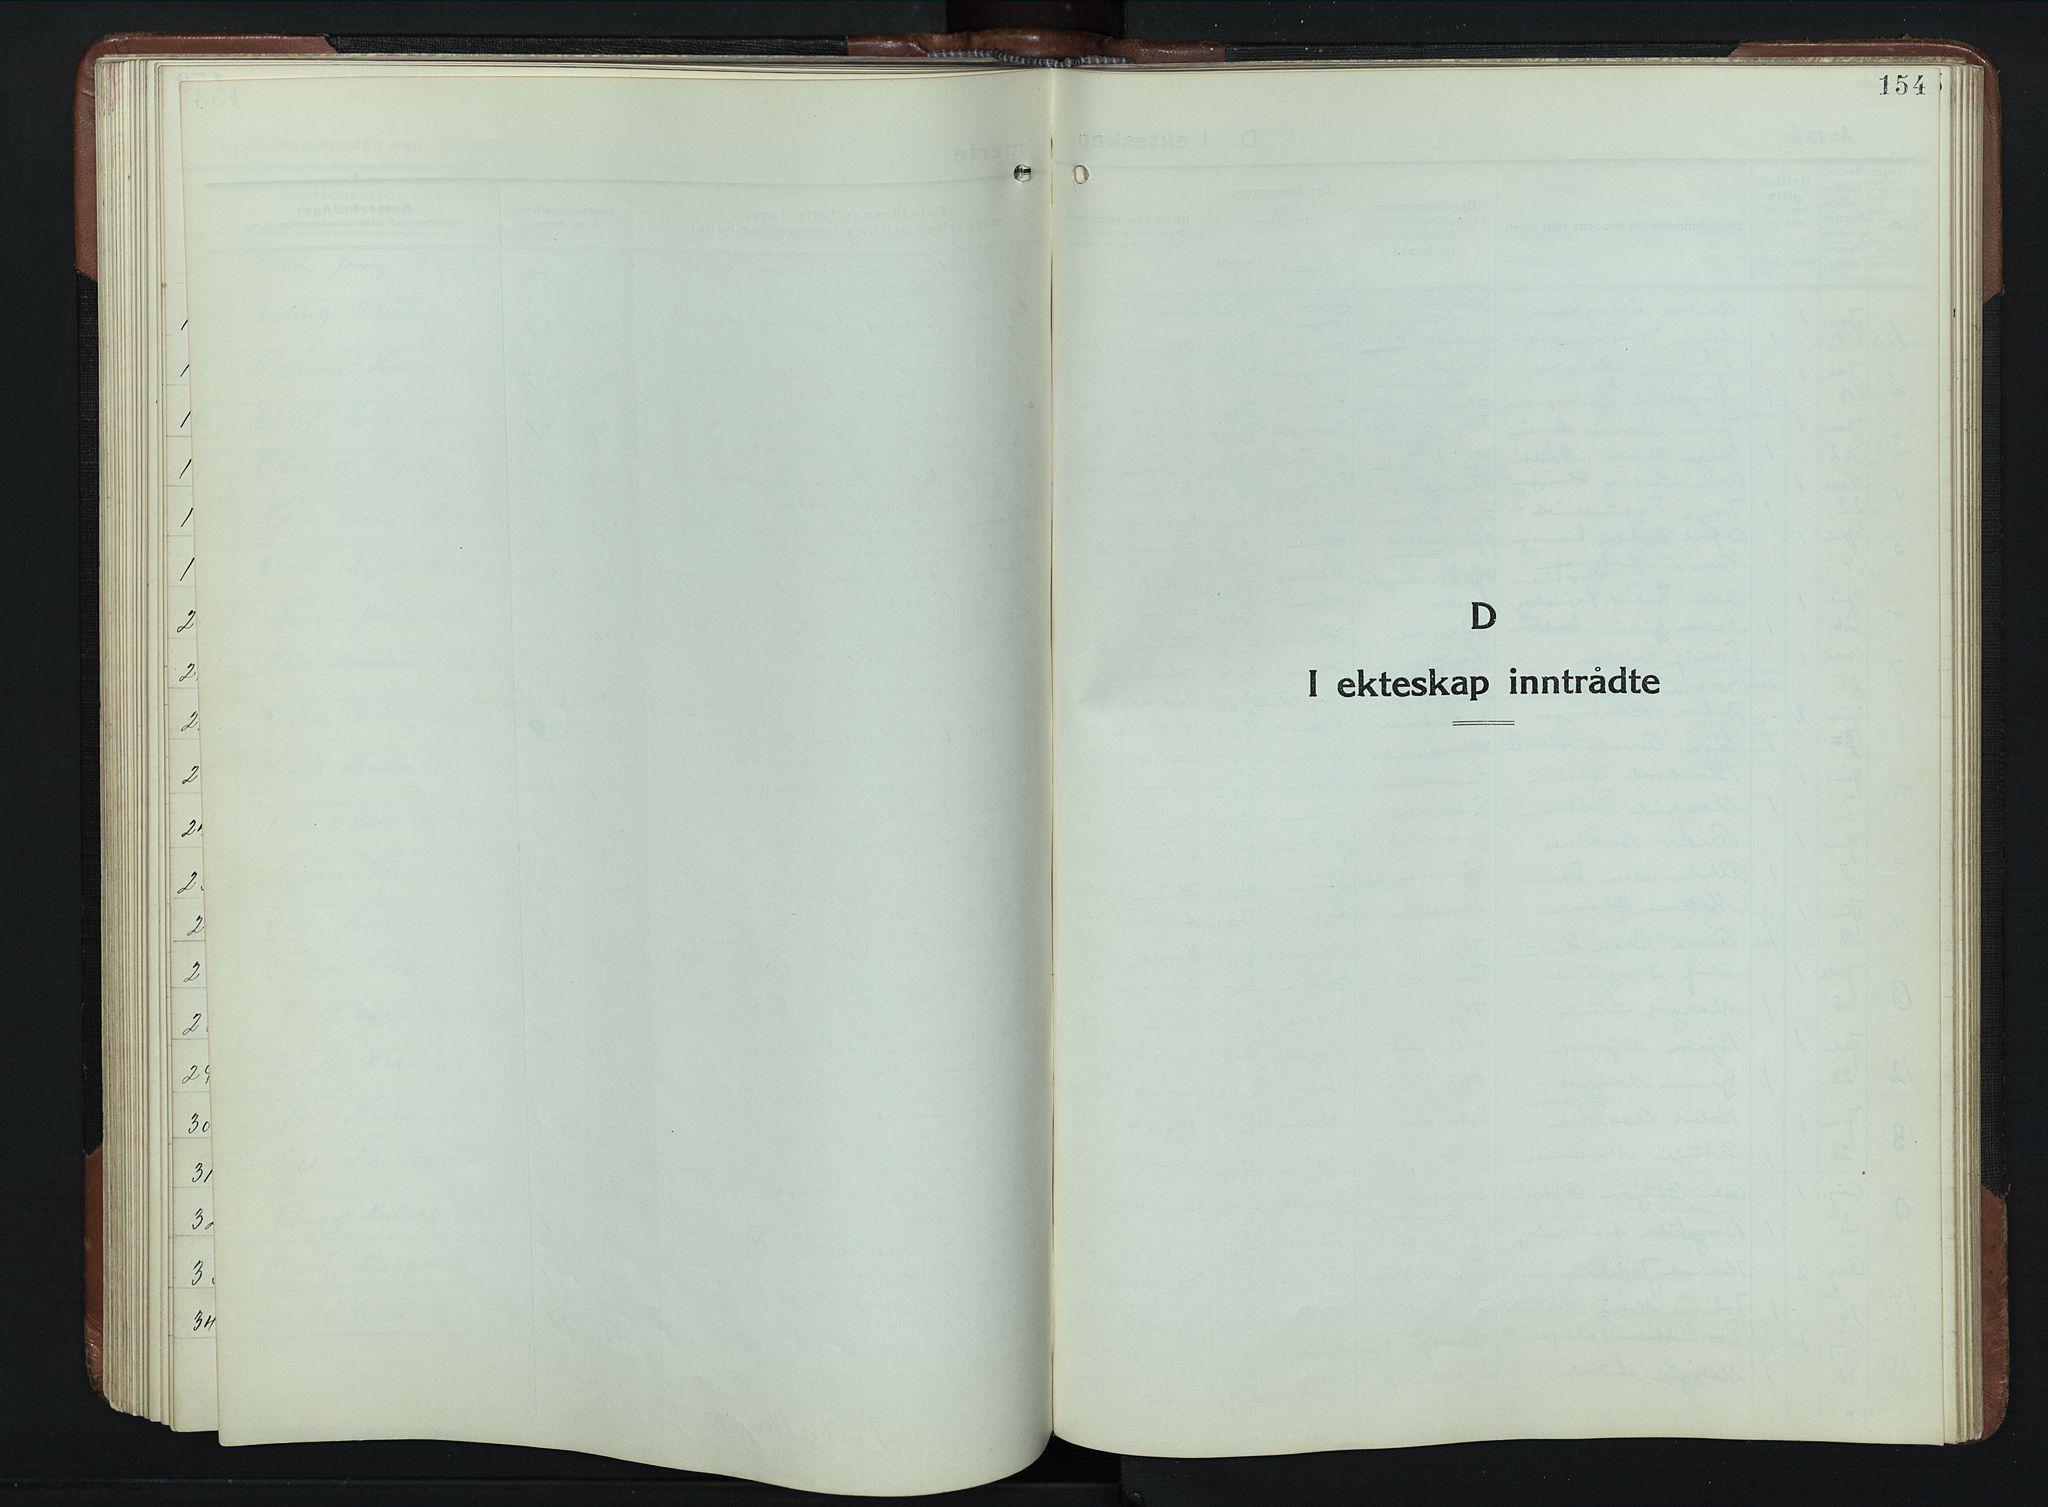 SAH, Vardal prestekontor, H/Ha/Hab/L0023: Klokkerbok nr. 23, 1929-1941, s. 154